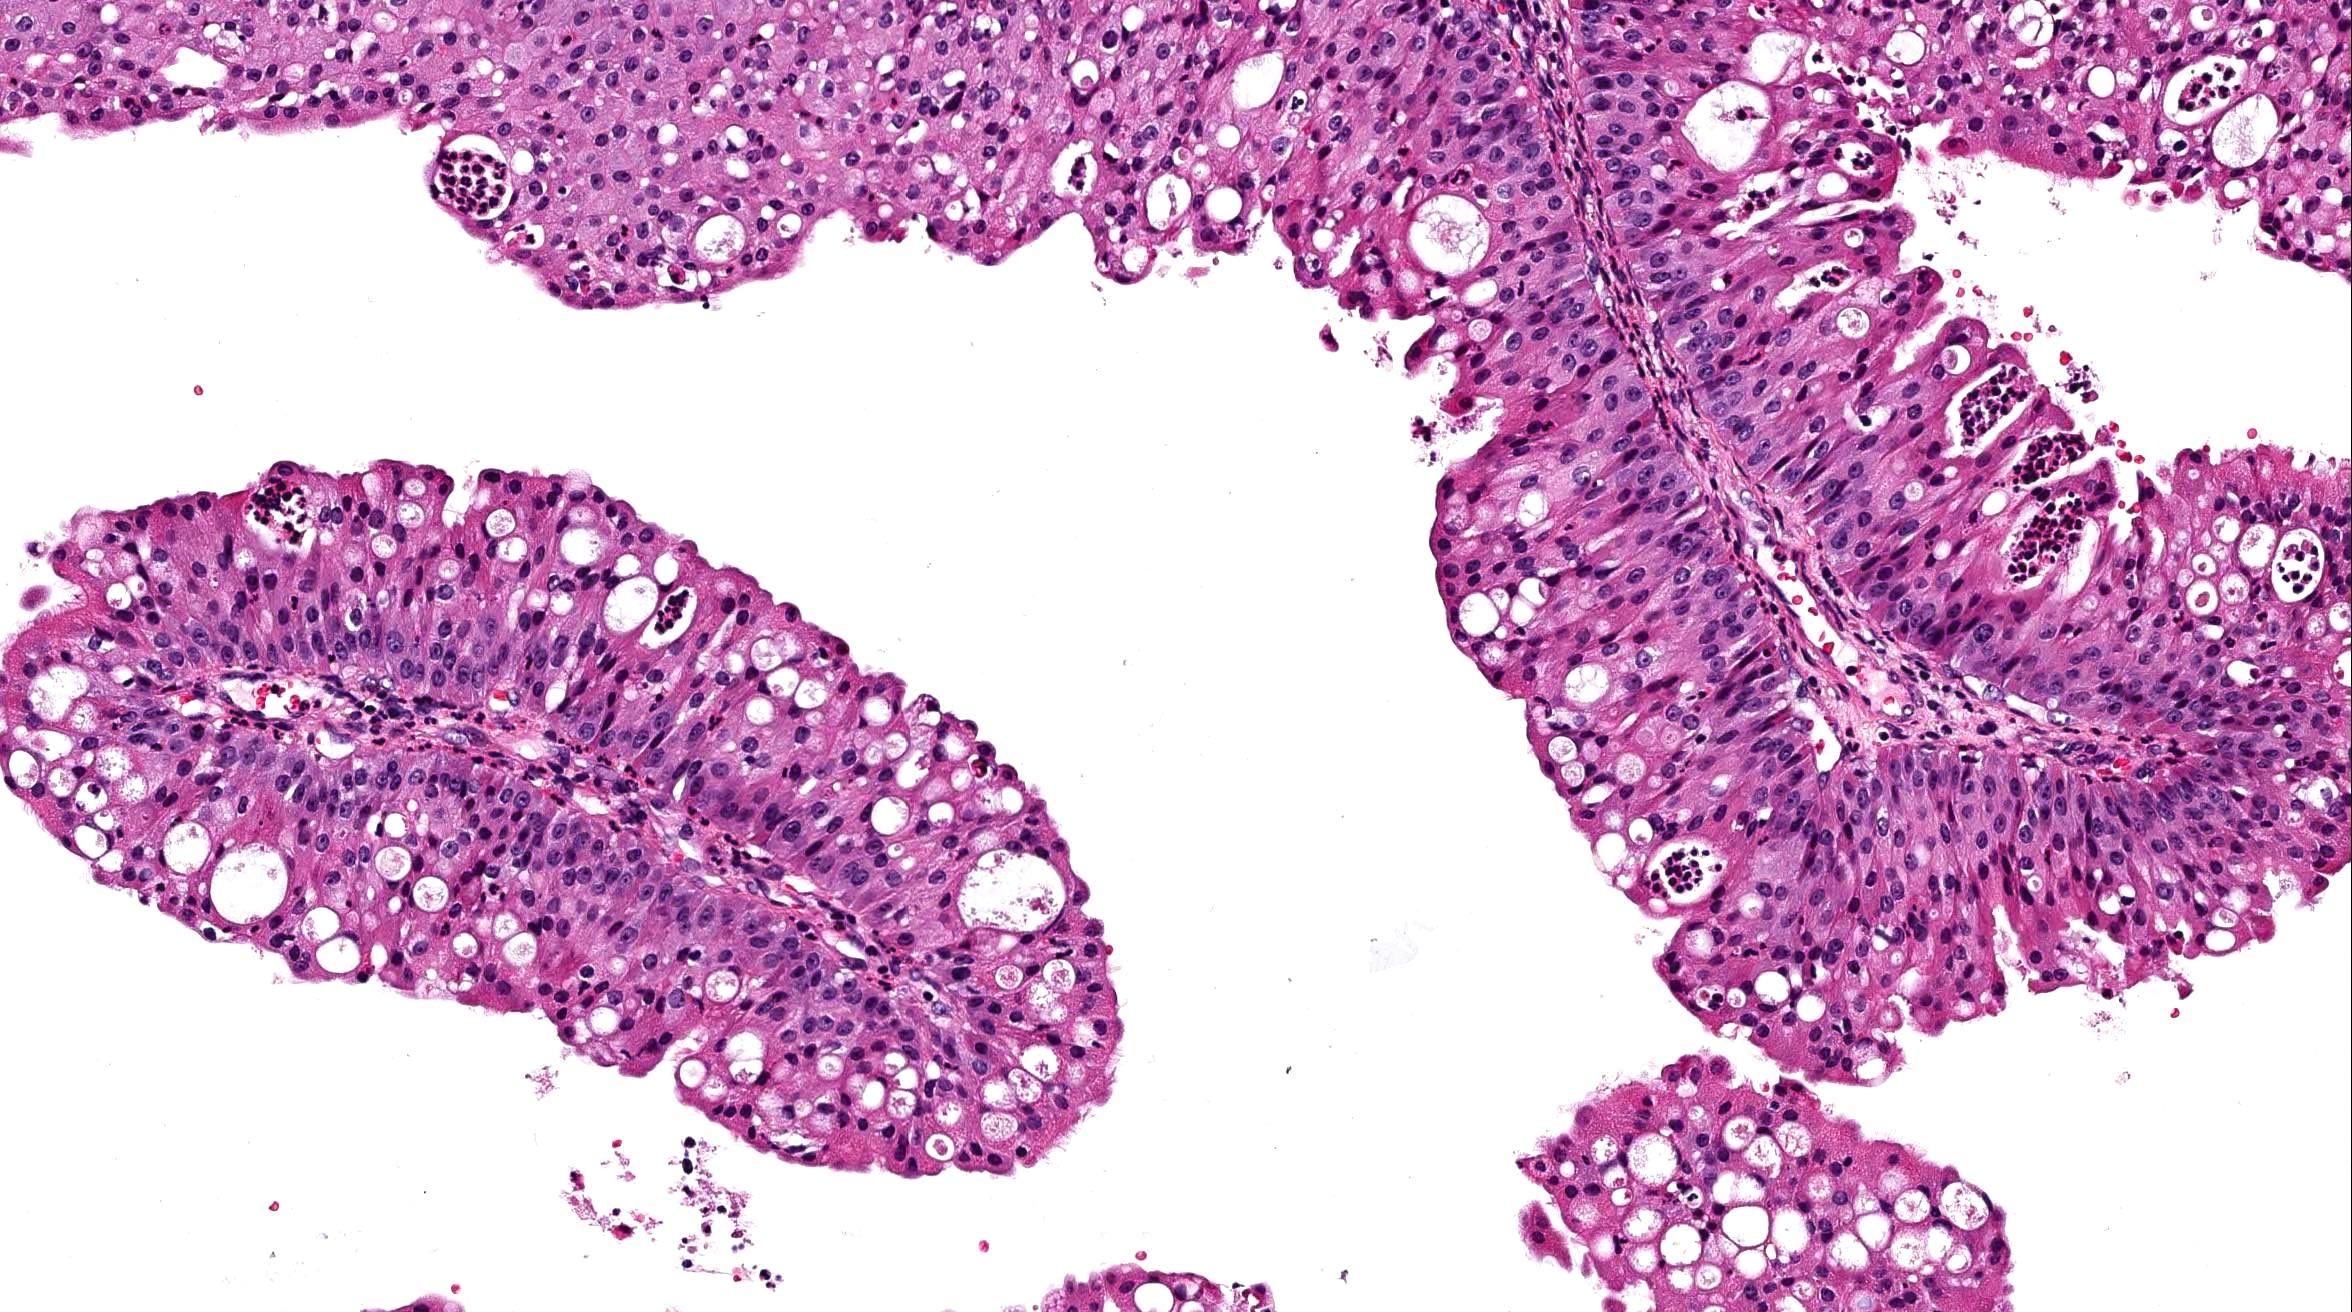 efectele metalelor grele asupra plantelor cancer ovarian neoplasm